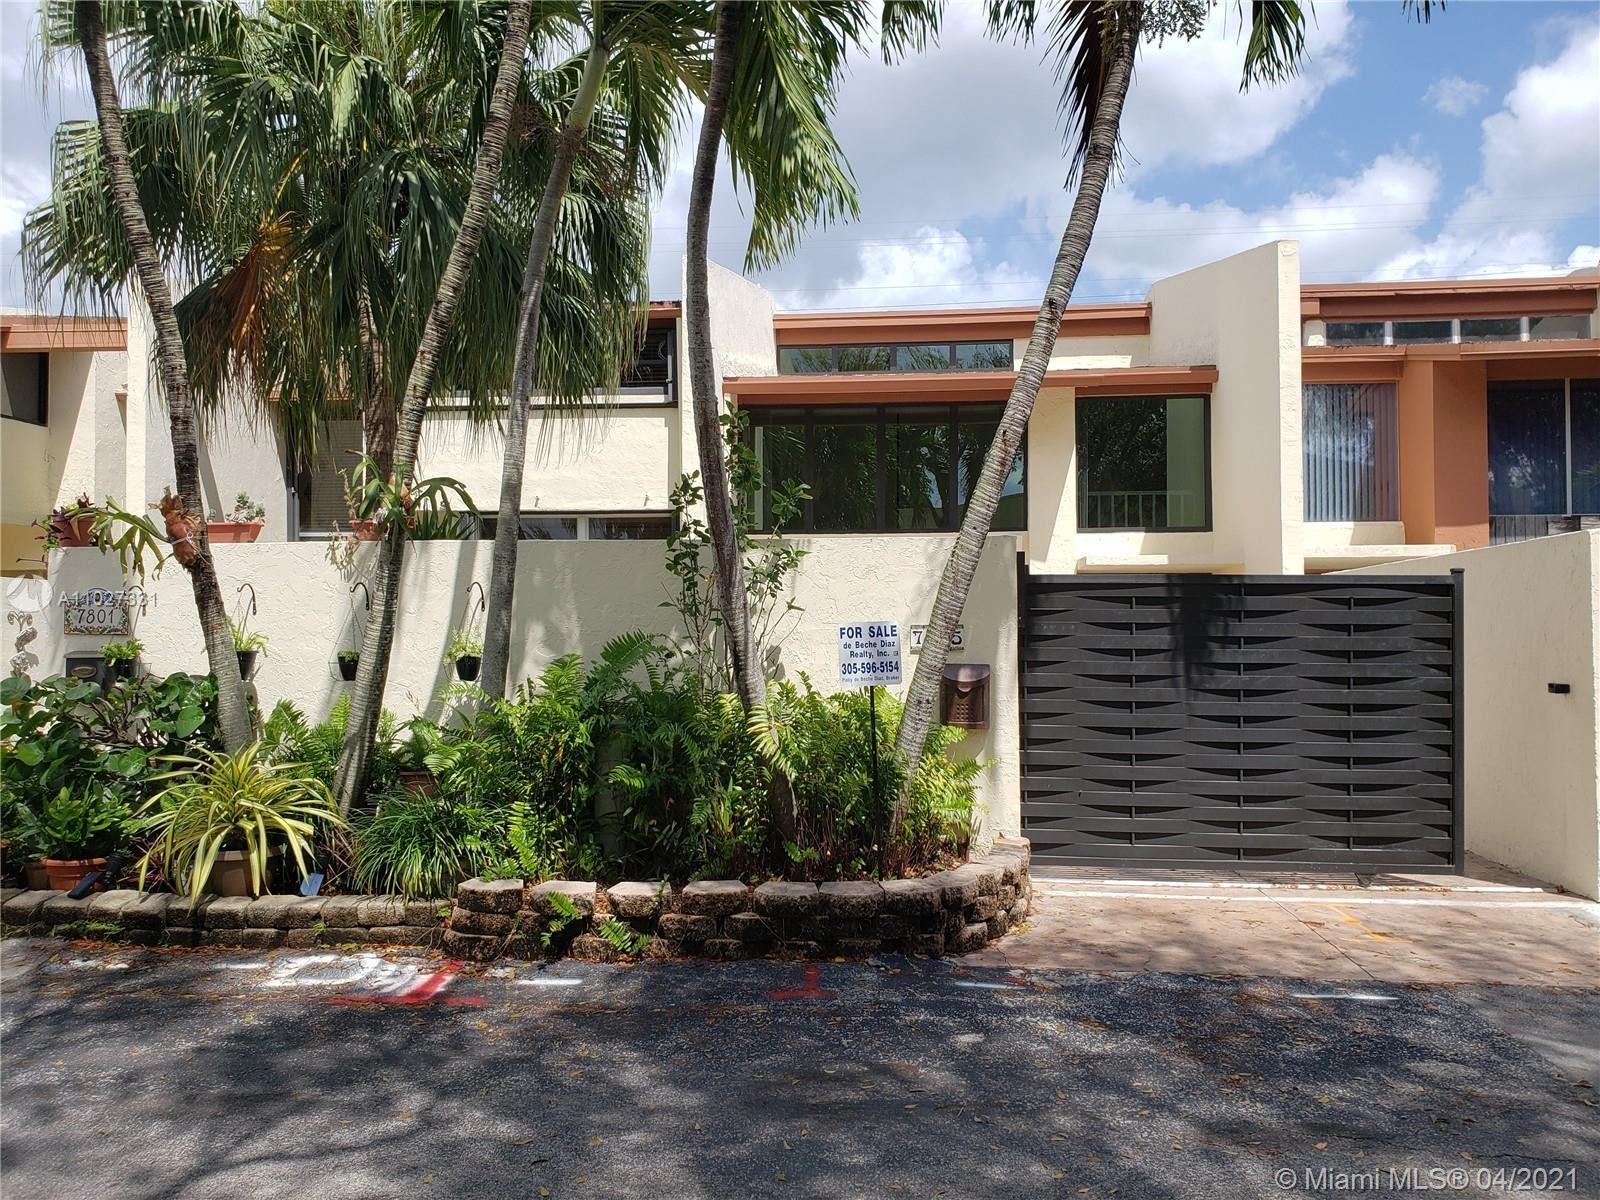 7805 SW 103rd Pl #7805, Miami, FL 33173 - #: A11027331